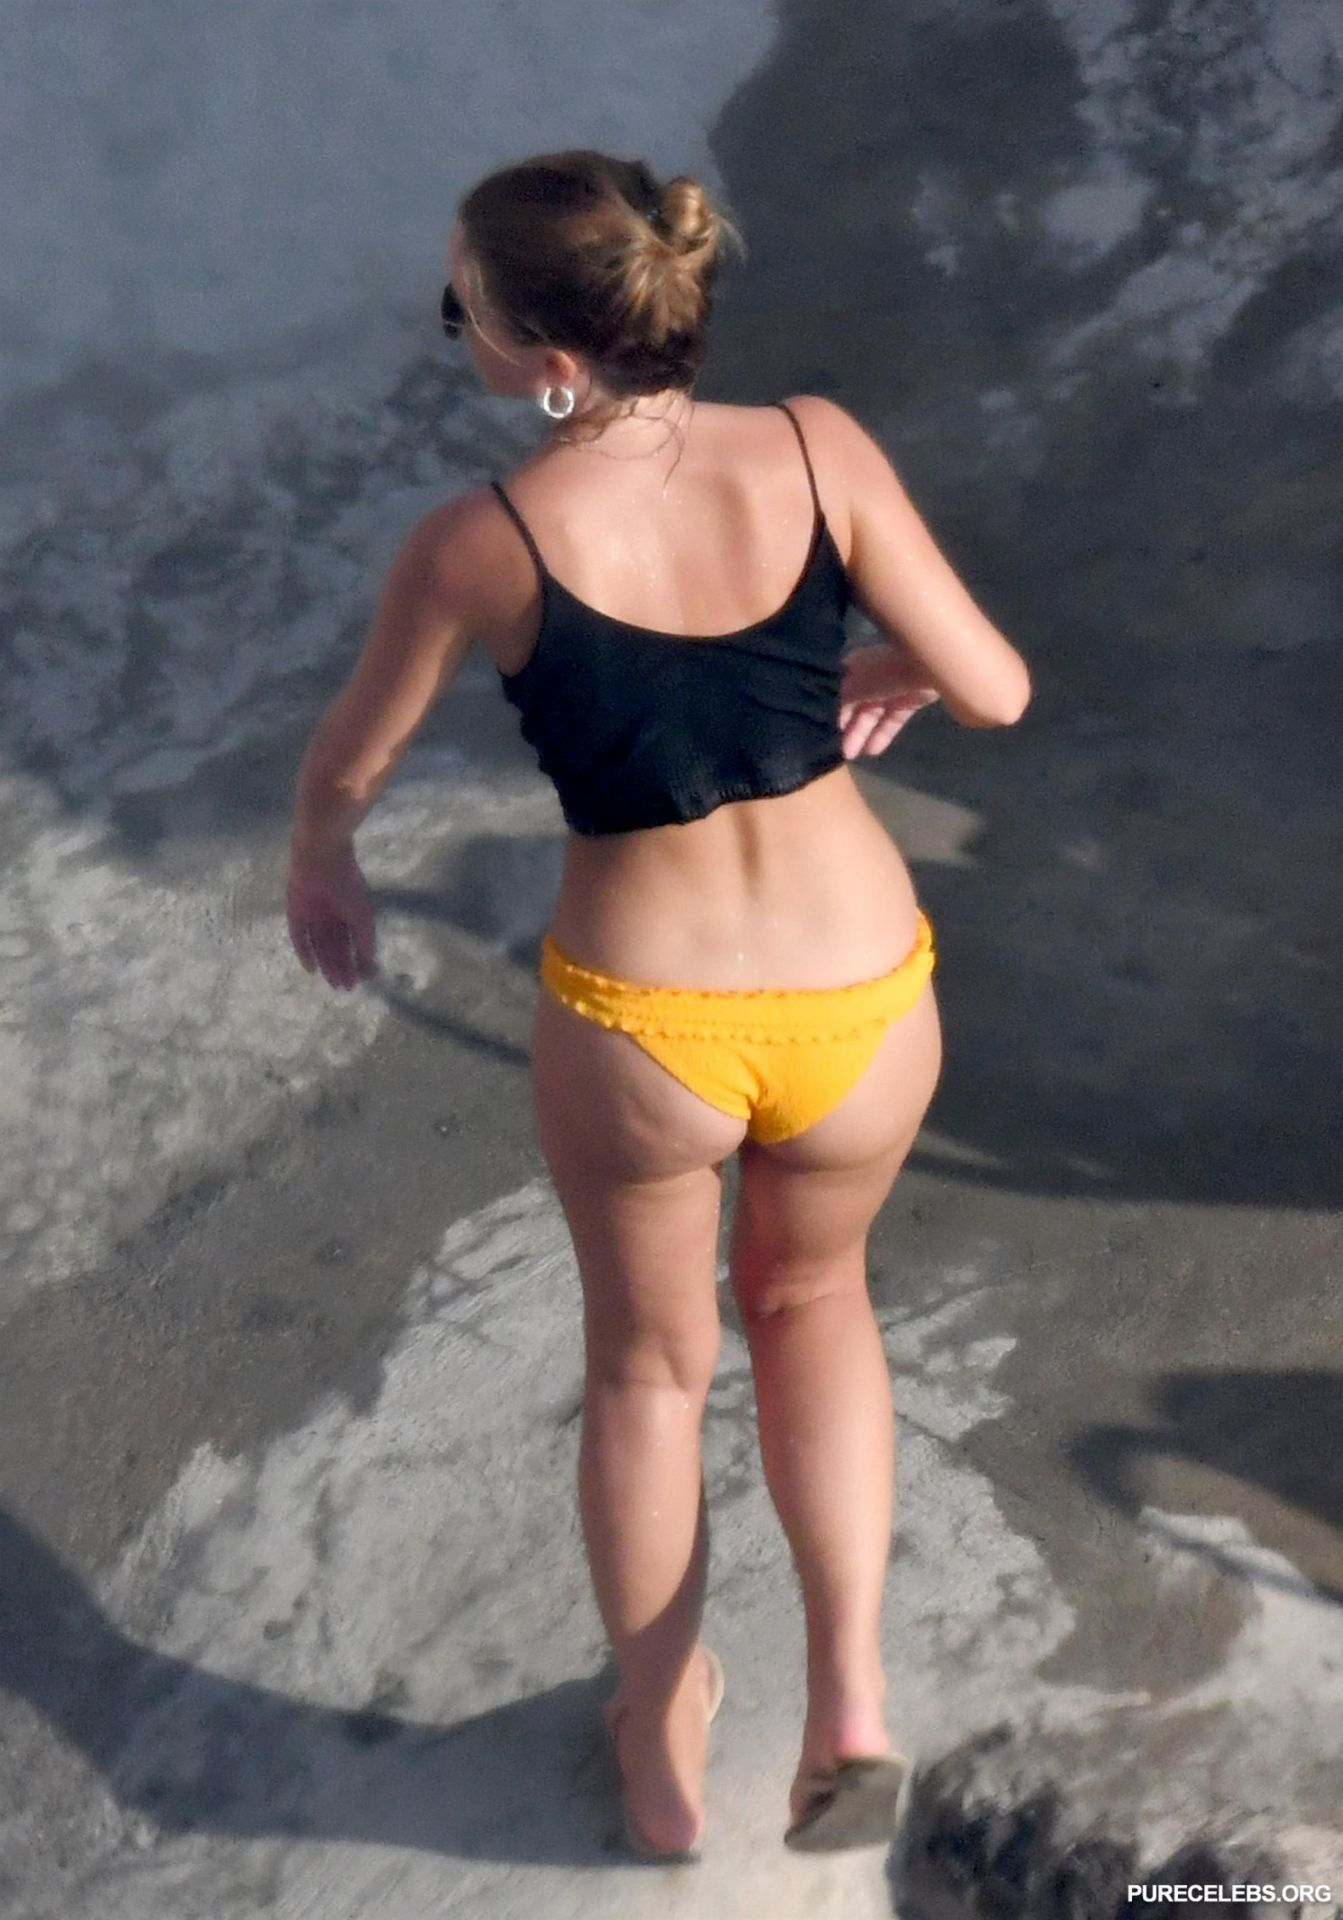 Emma Watson leaked photos (57857). Best celebrity Emma